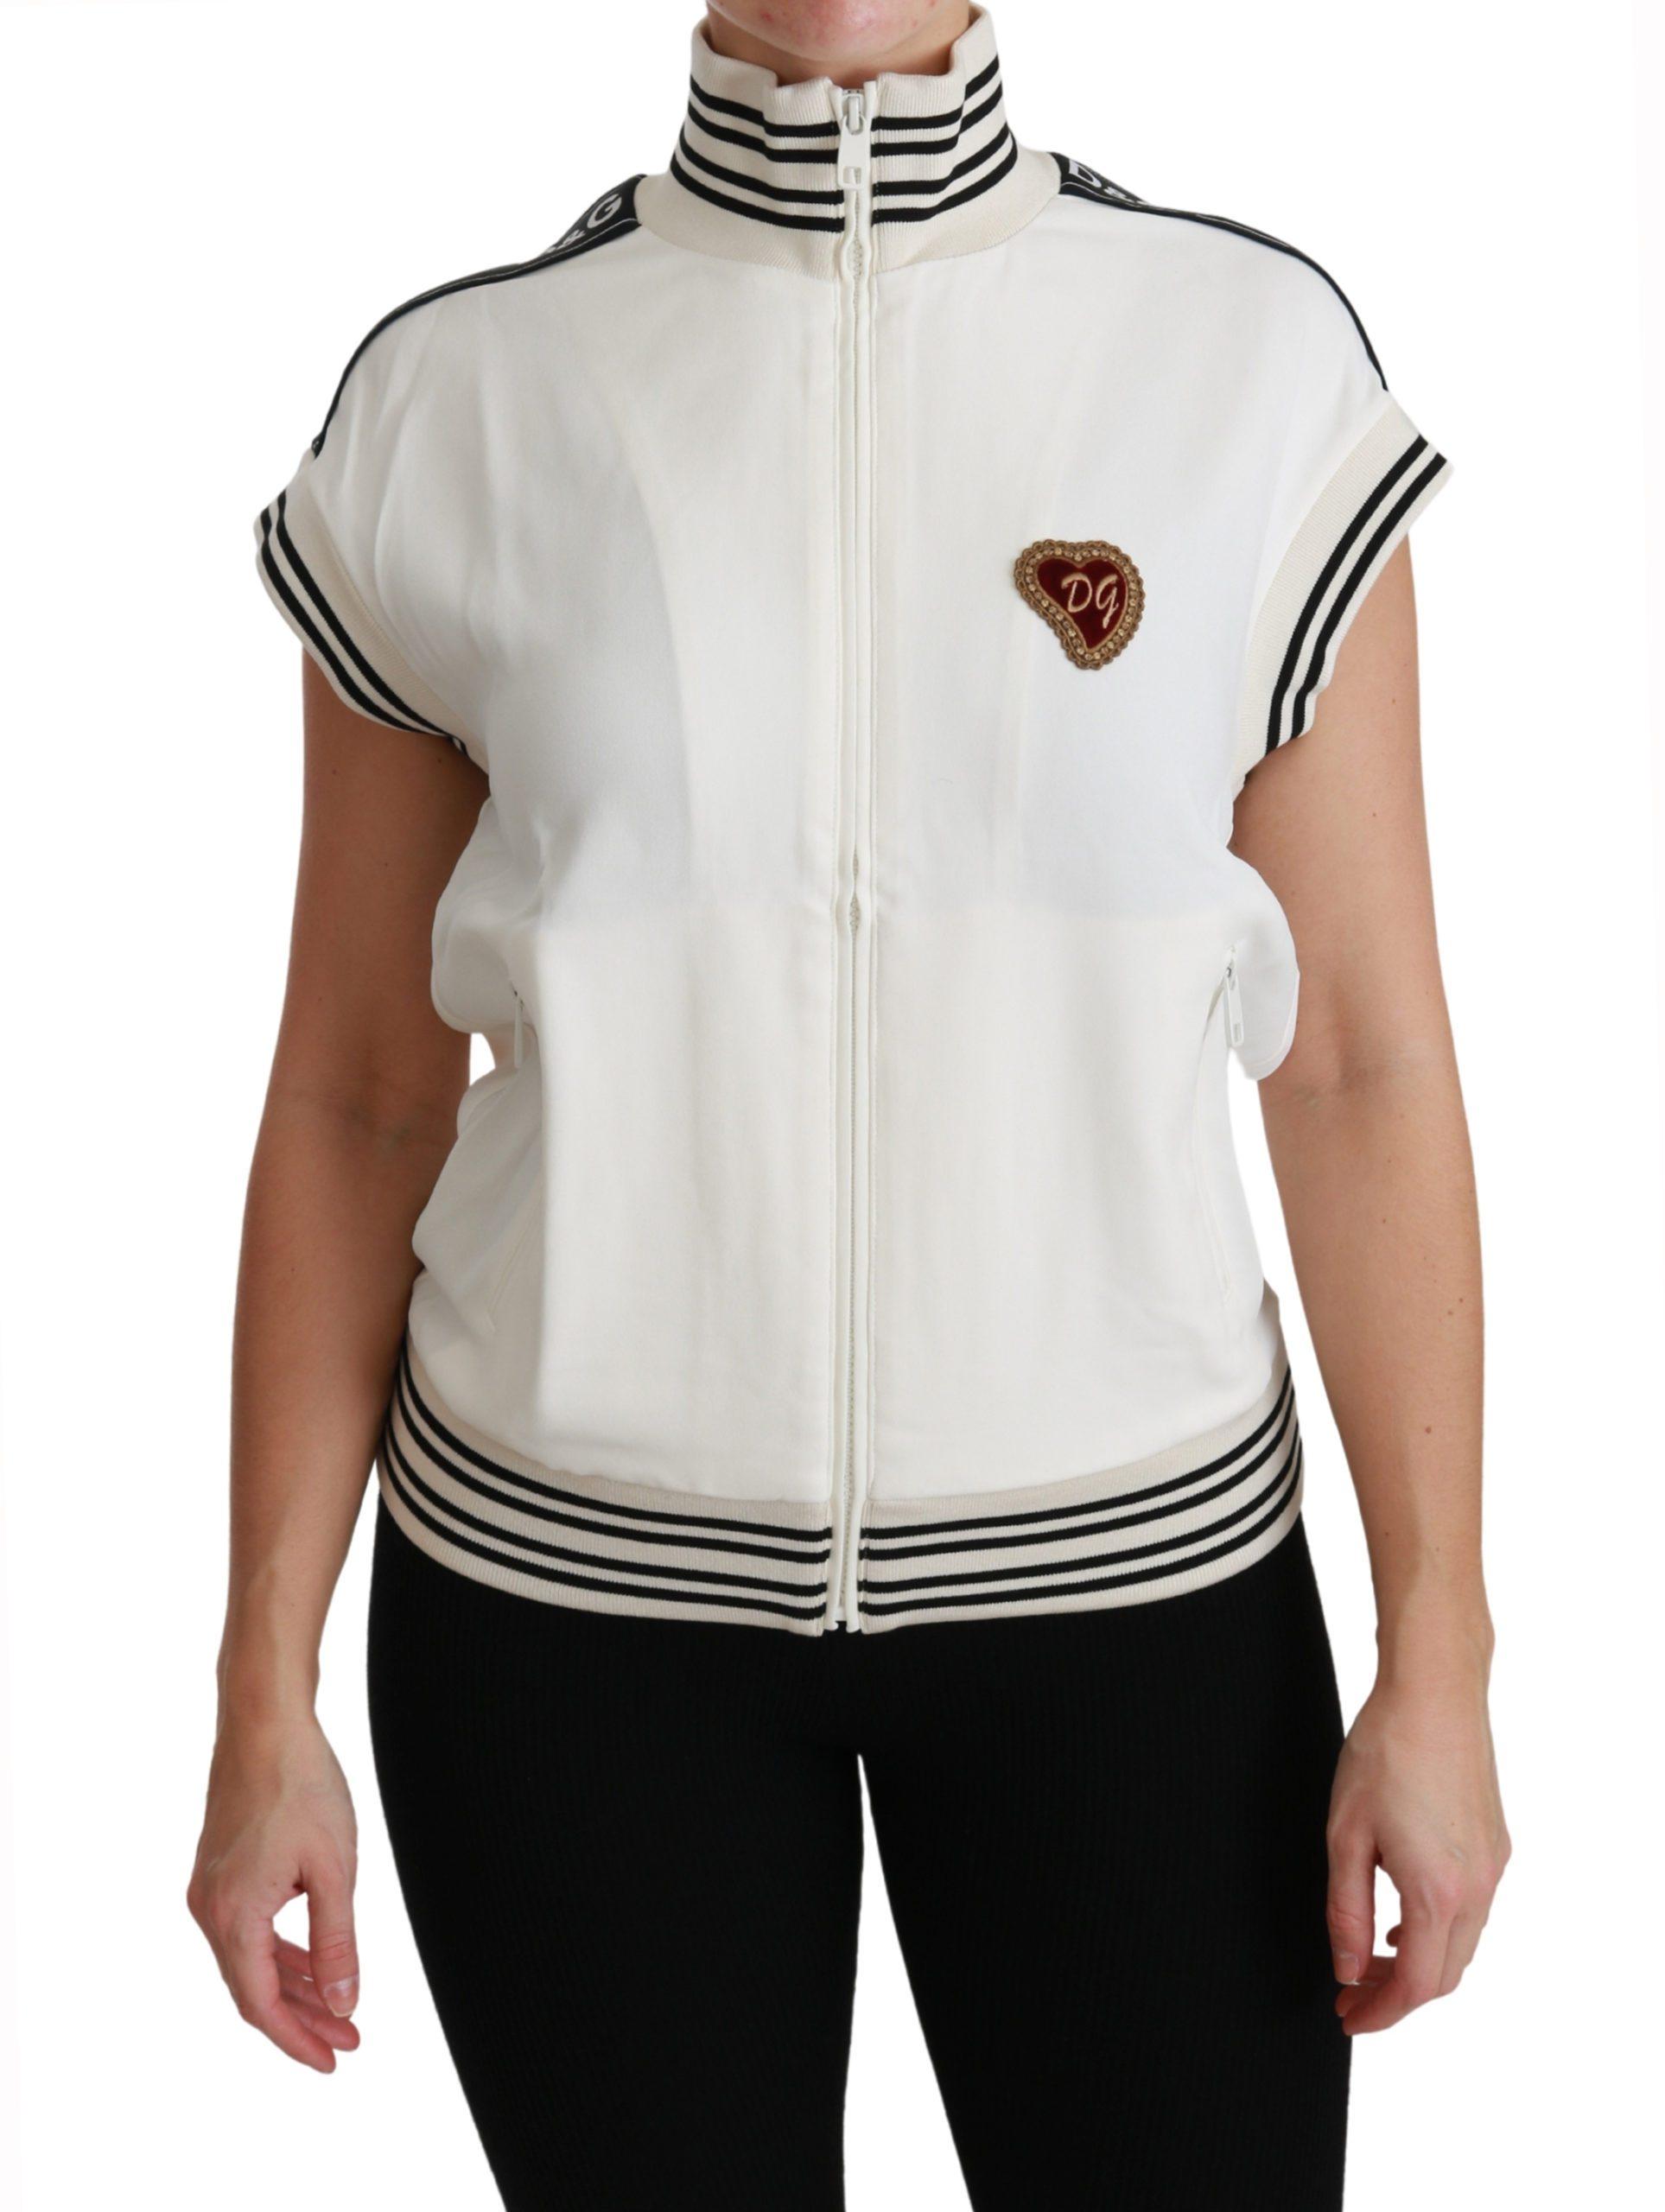 Dolce & Gabbana Women's Sacro Cuore Heart Zipper Sweater Black TSH4510 - IT36 | XS